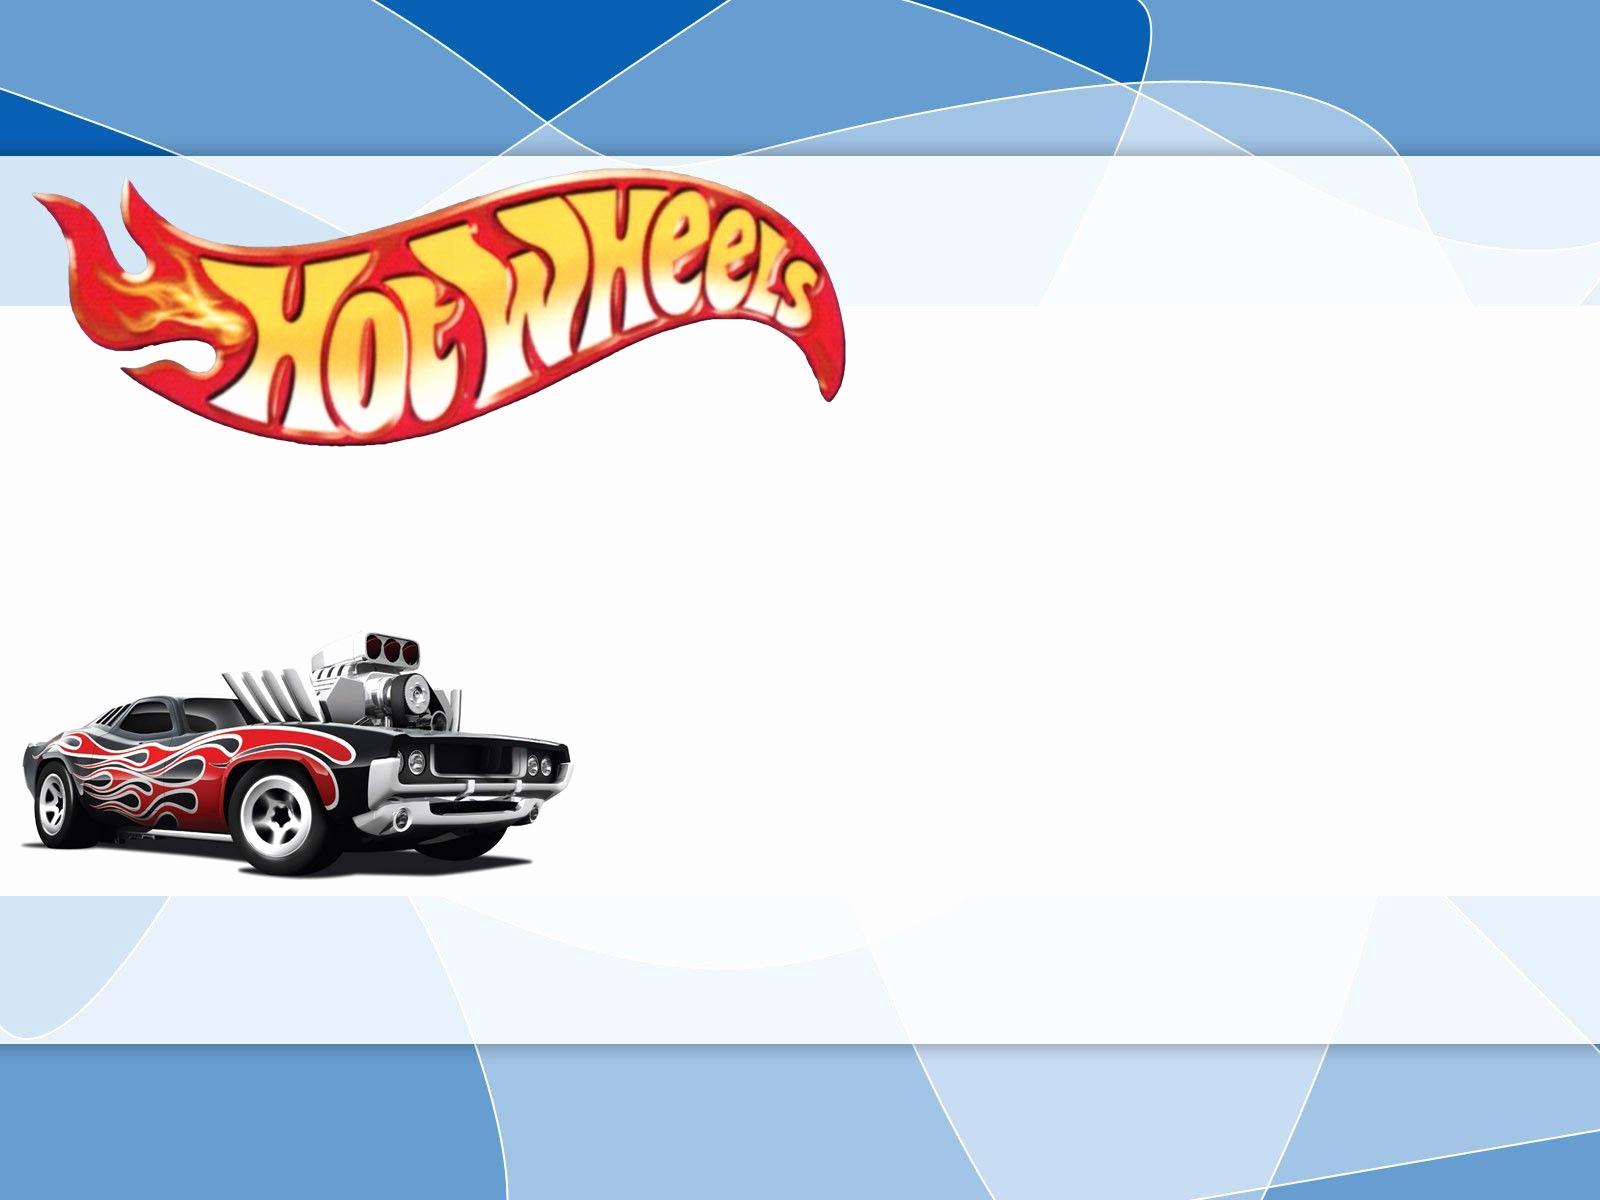 Hot Wheels Invitation Template Luxury Free Printable Hot Wheels Invitation Templates for